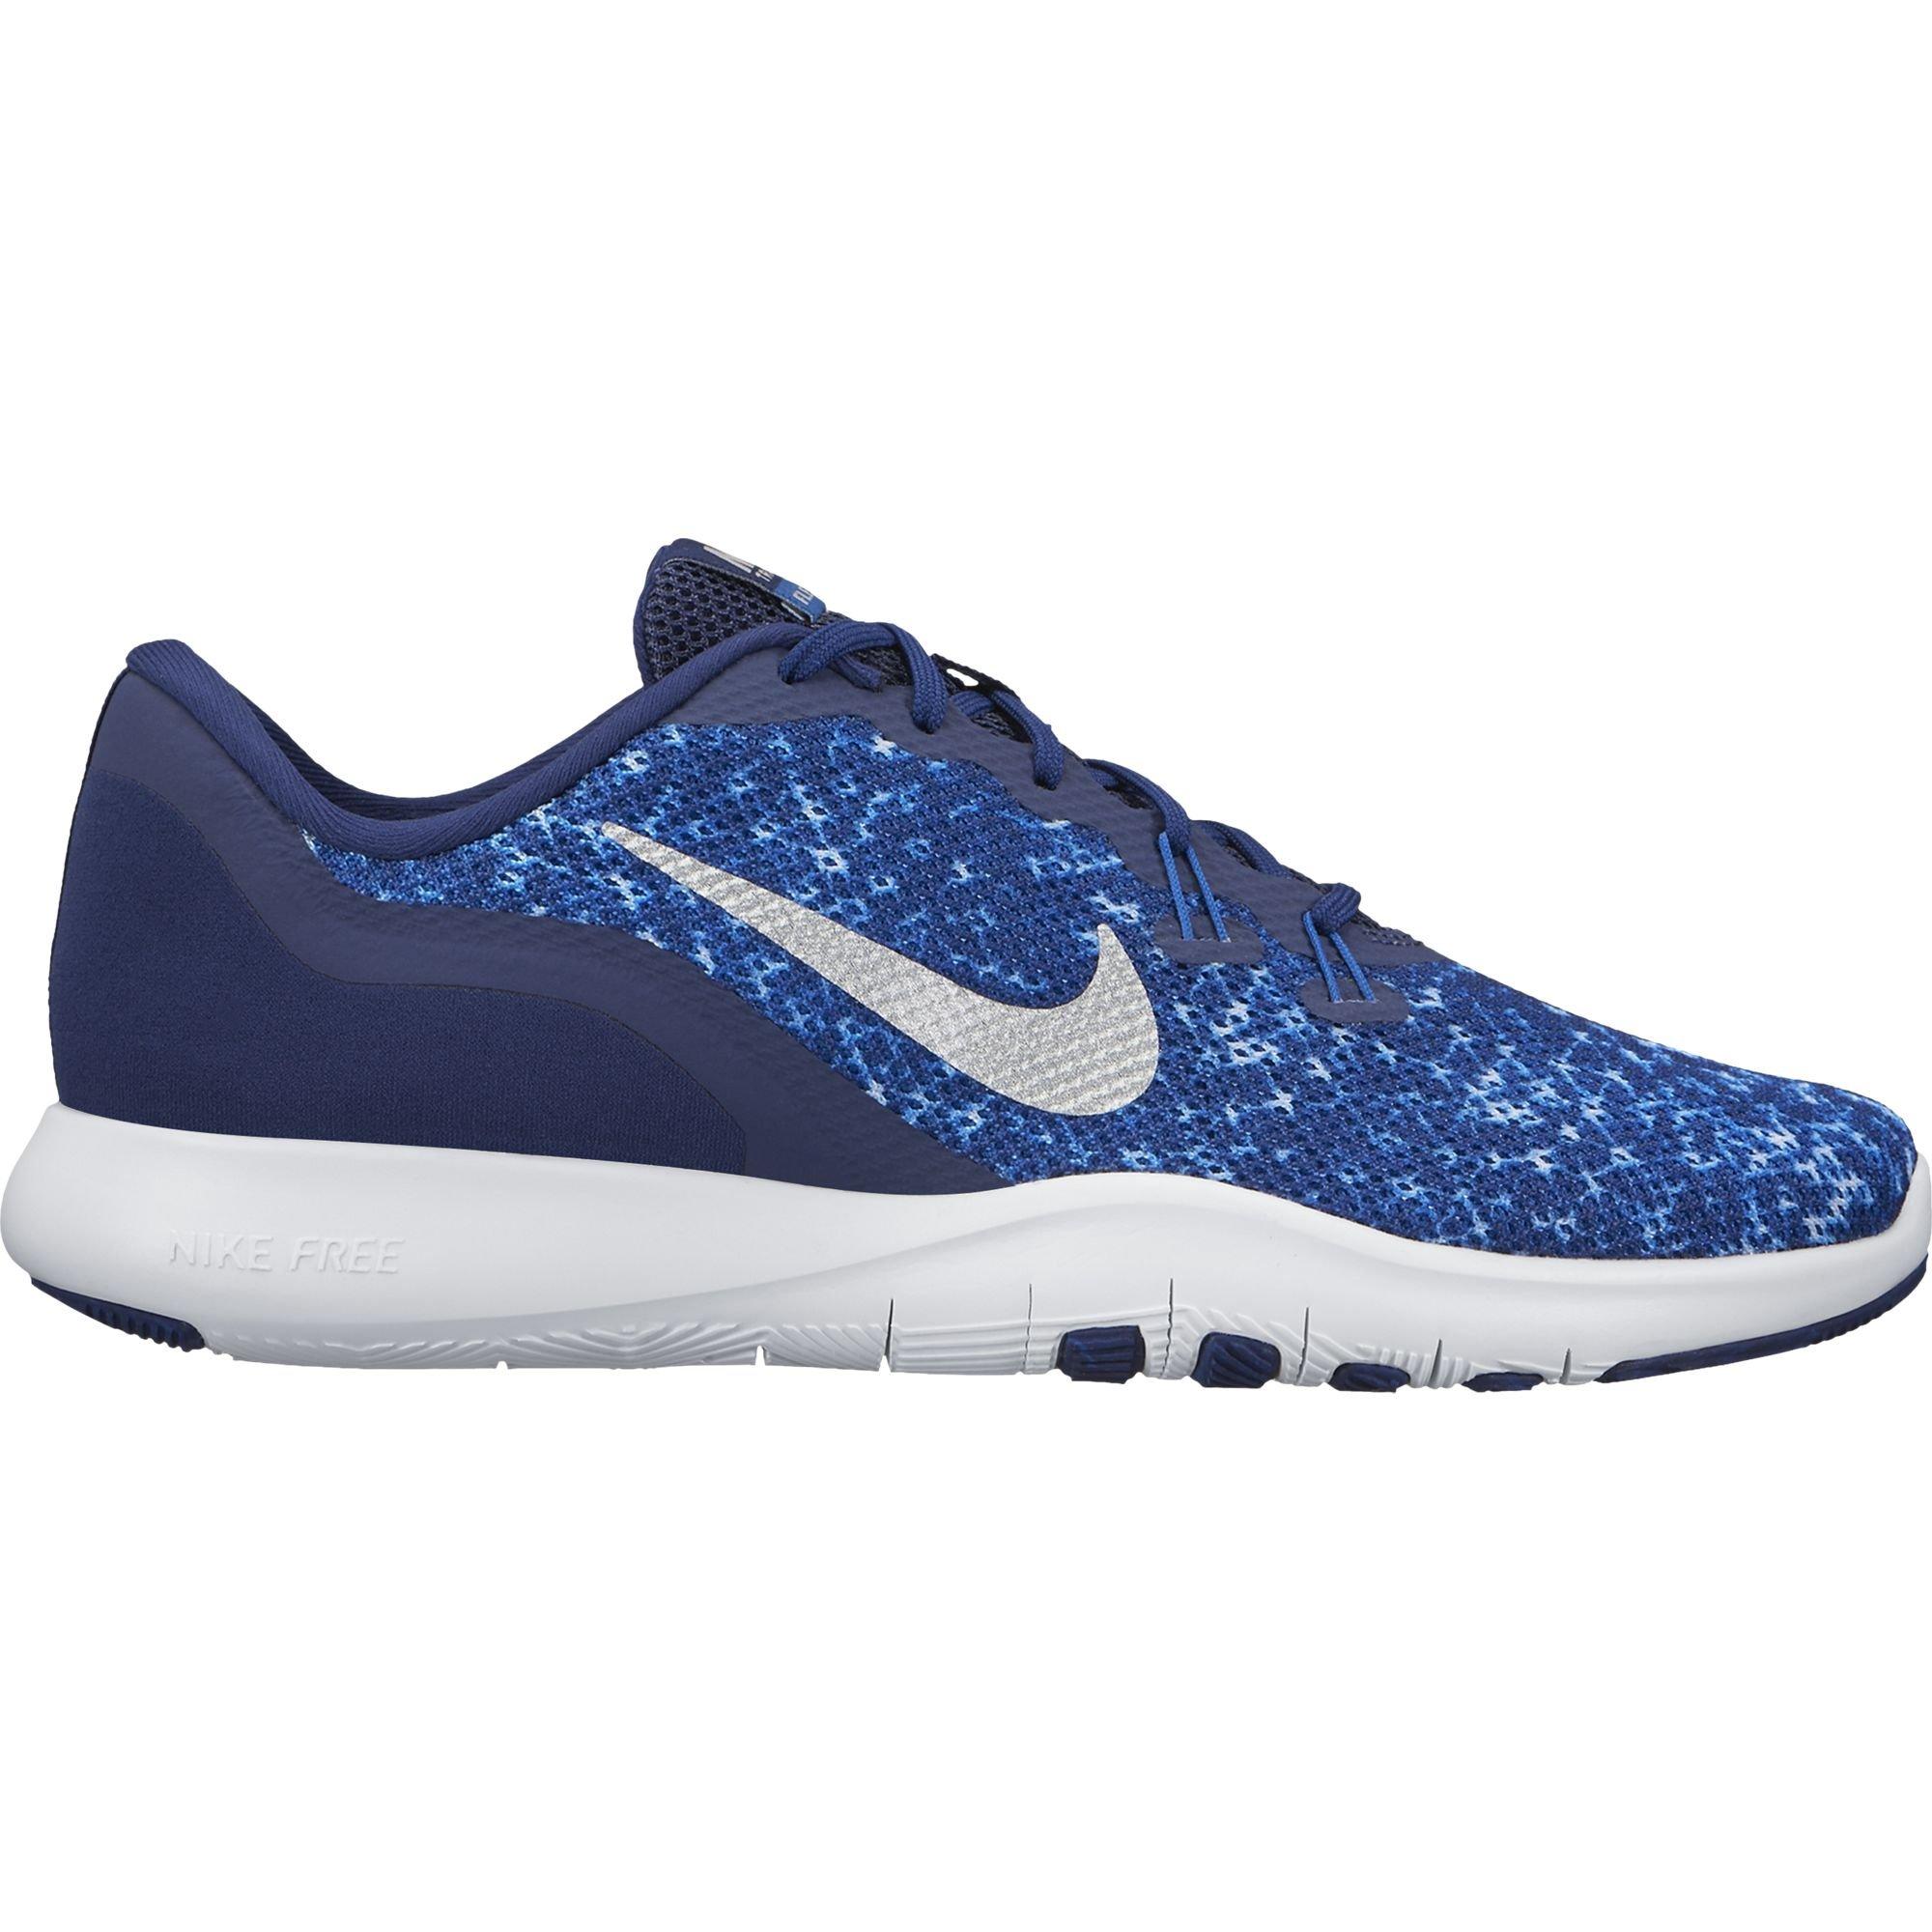 Galleon - NIKE Flex Trainer 7 Womens Training Shoes Binary Blue Metallic  Silver Black 11 d57531d6e97b9